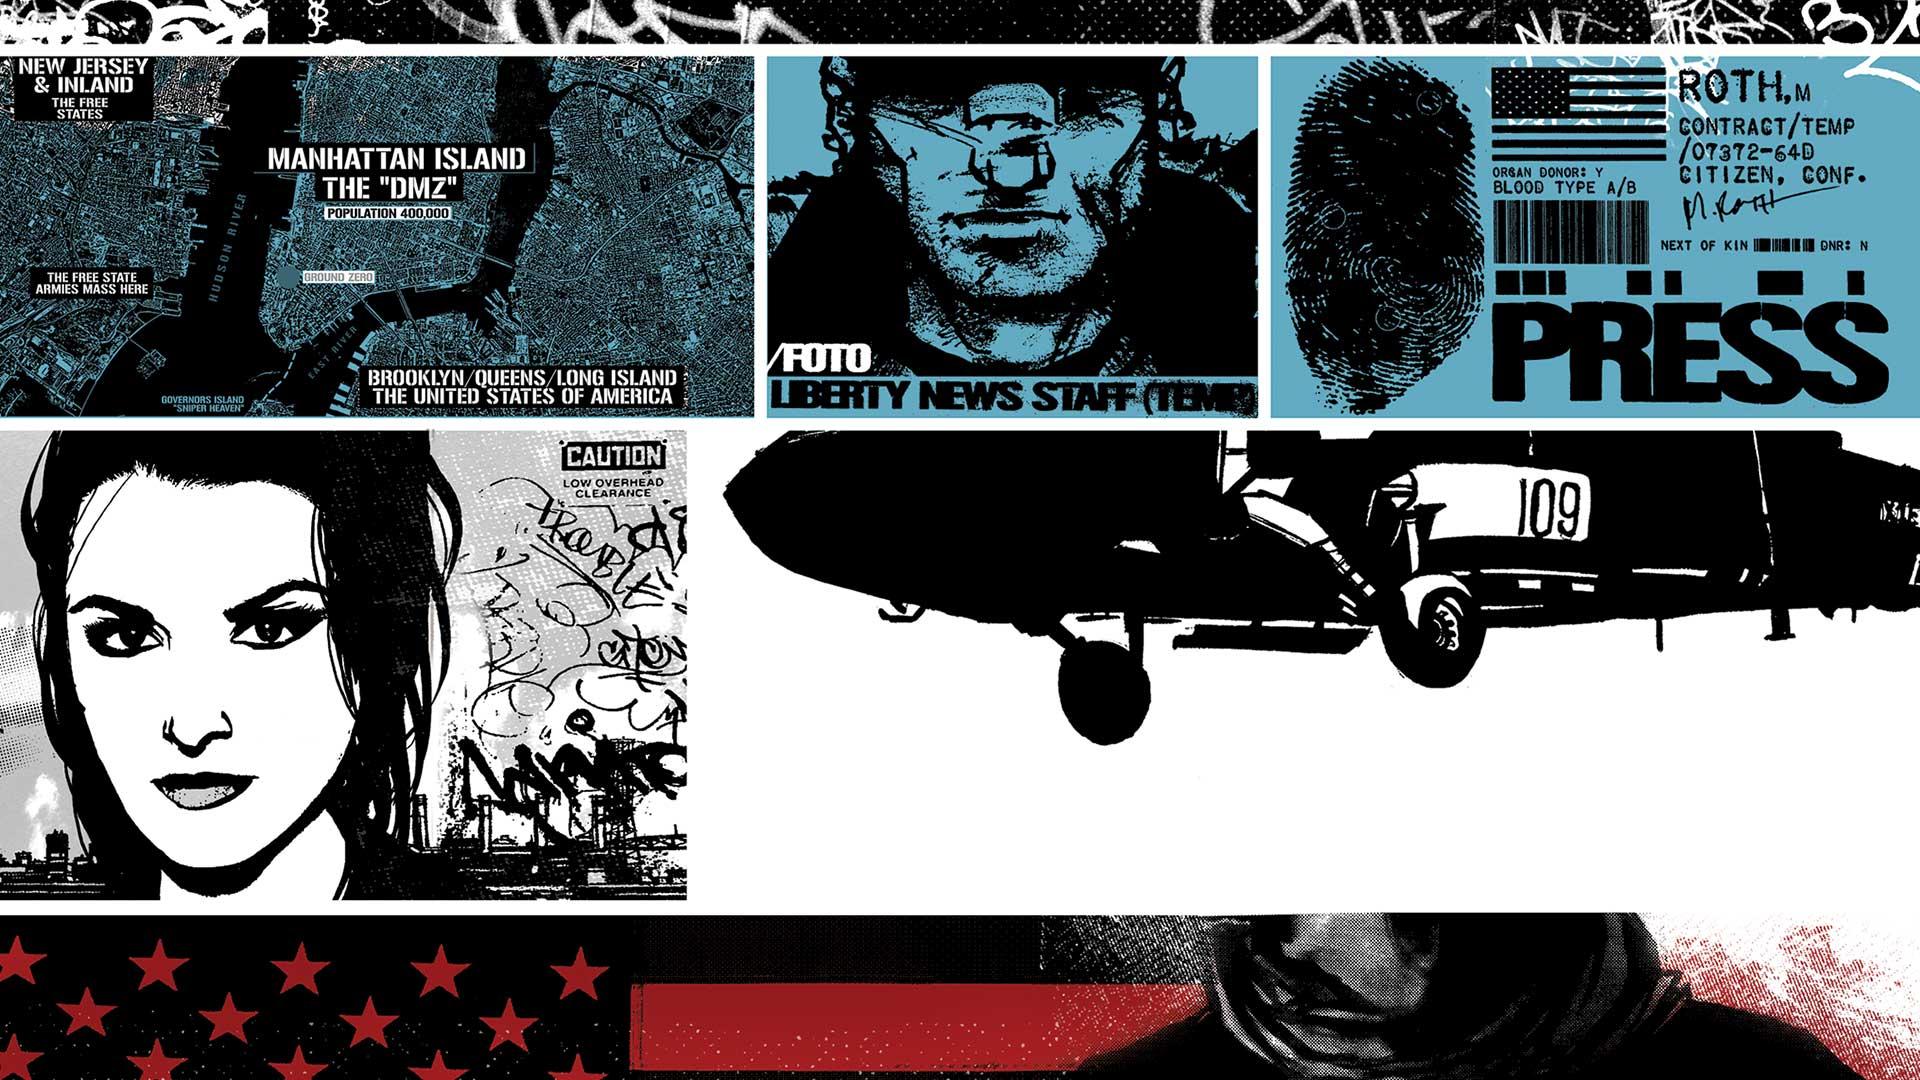 Politische Comics zur U.S.-Wahl